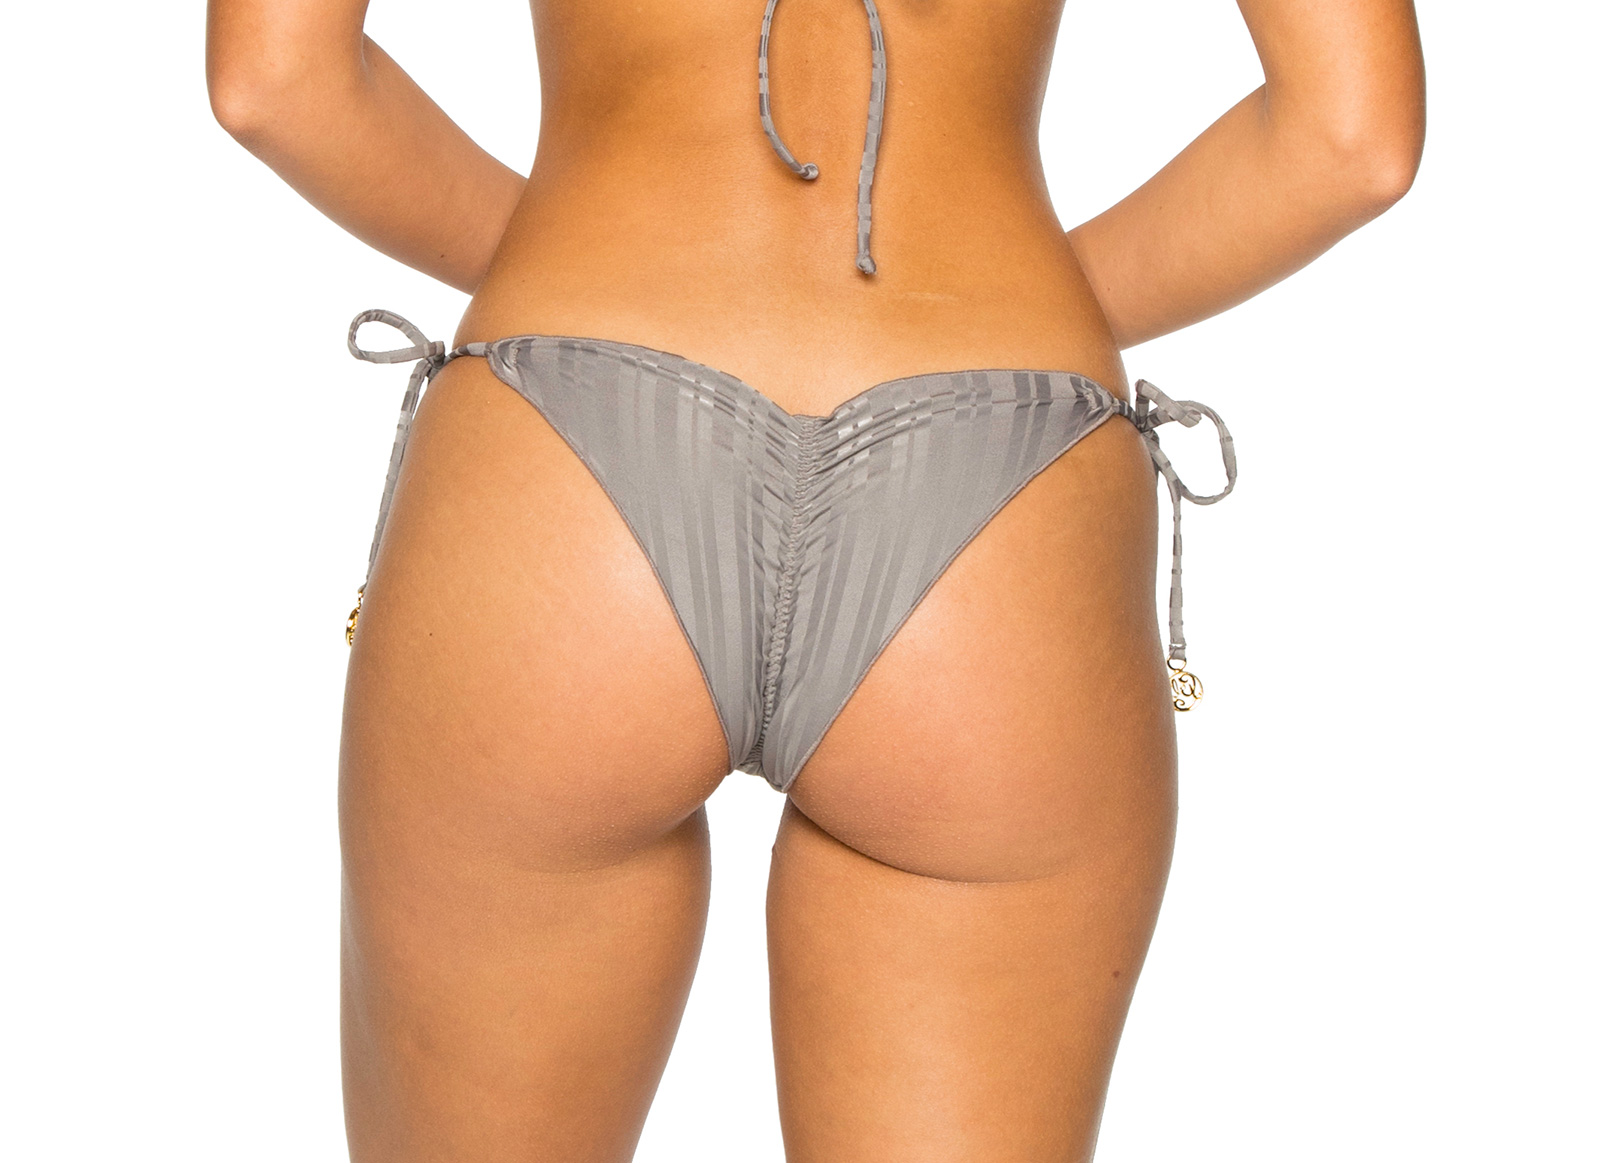 1ad0d9d6d5197 ... Side-tie grey scrunch Brazilian bikini bottom - BOTTOM SEAMLESS GREY  TURI TURAI ...